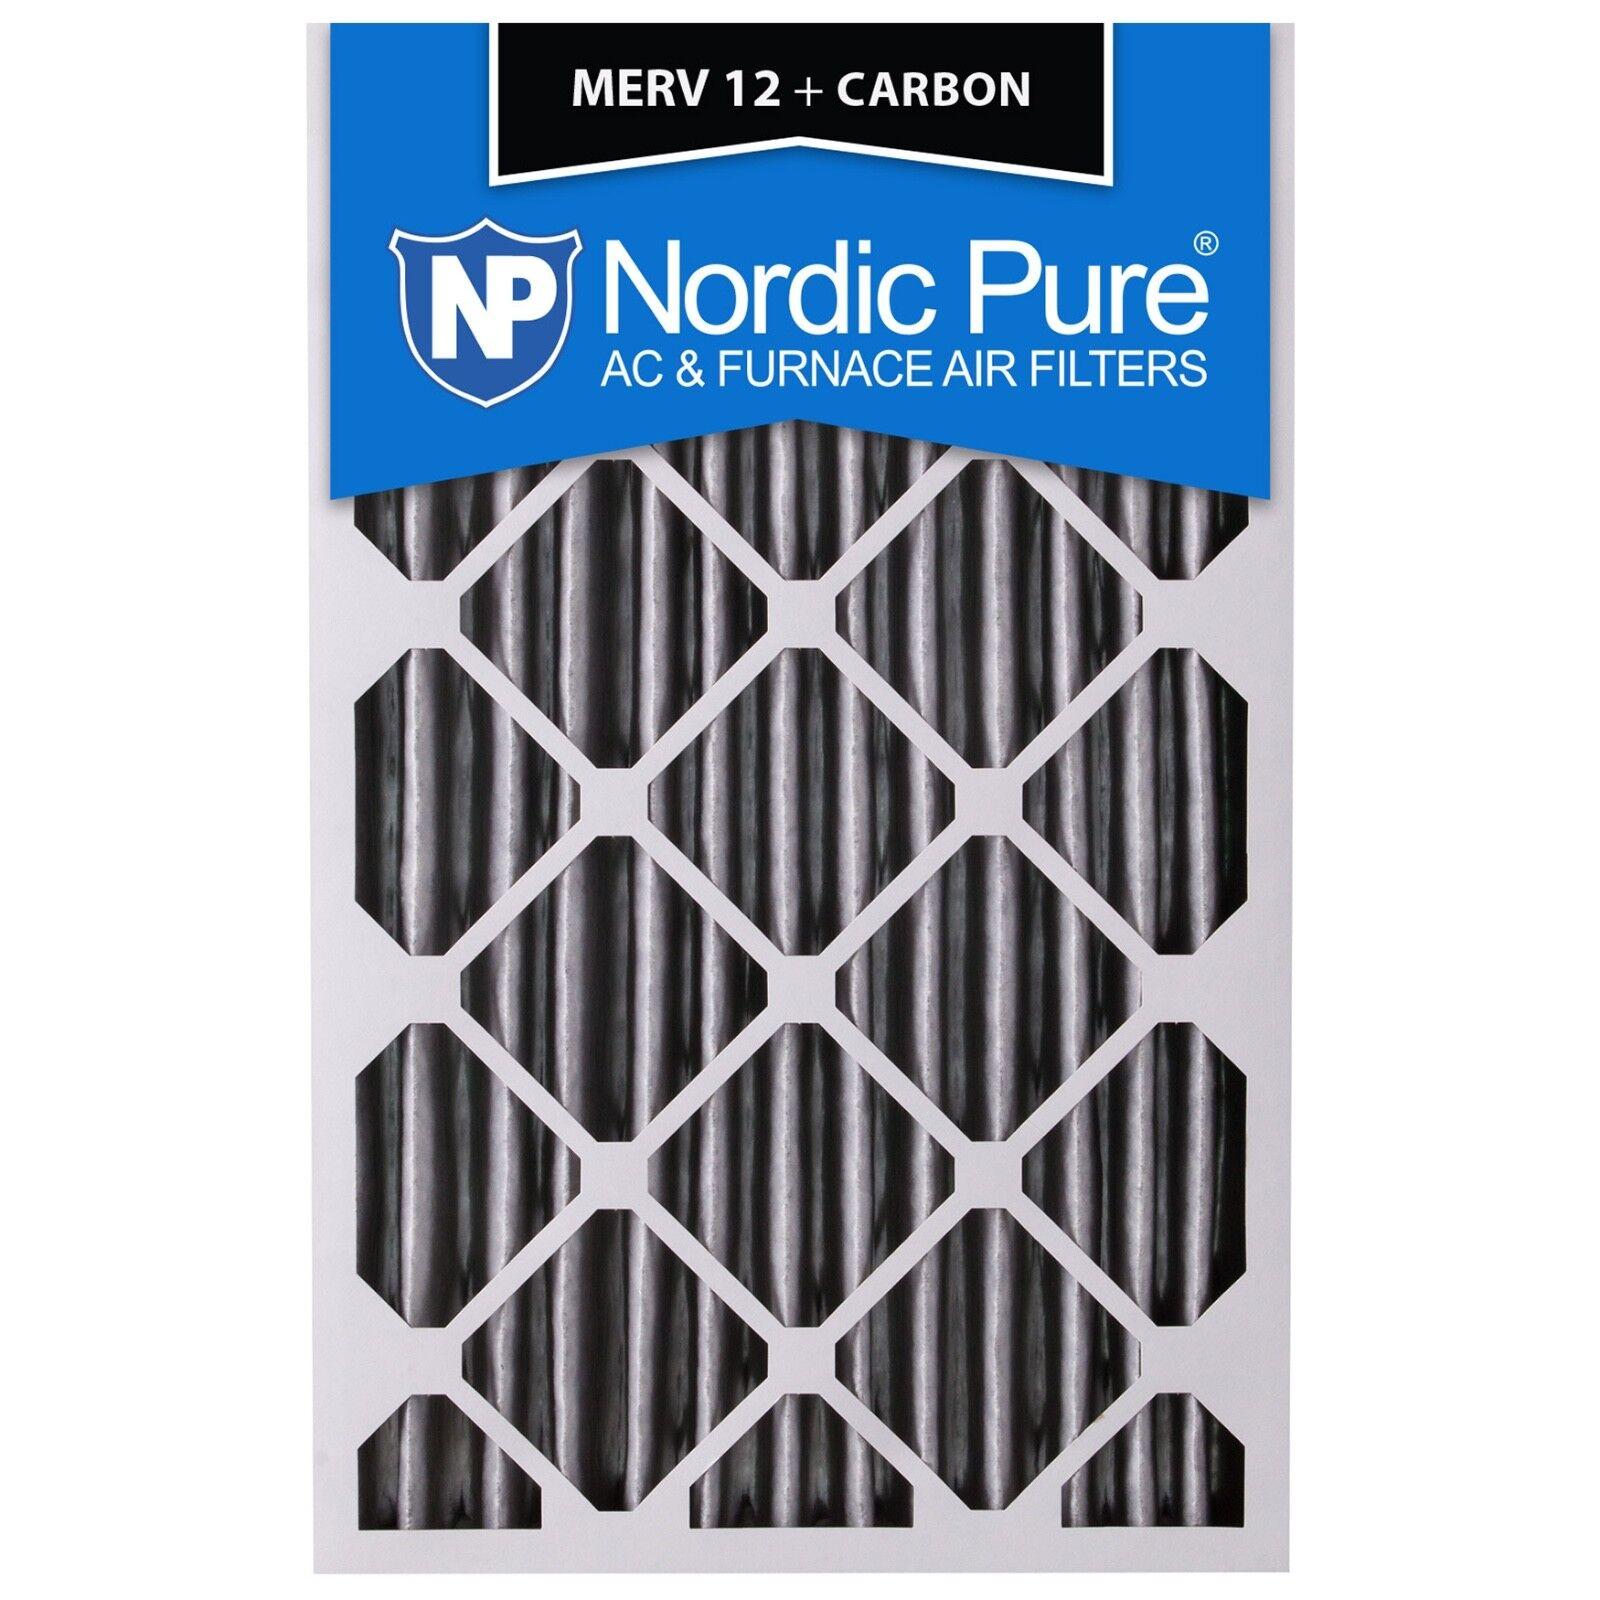 16x25x1 air filter charcoal carbon furnace merv